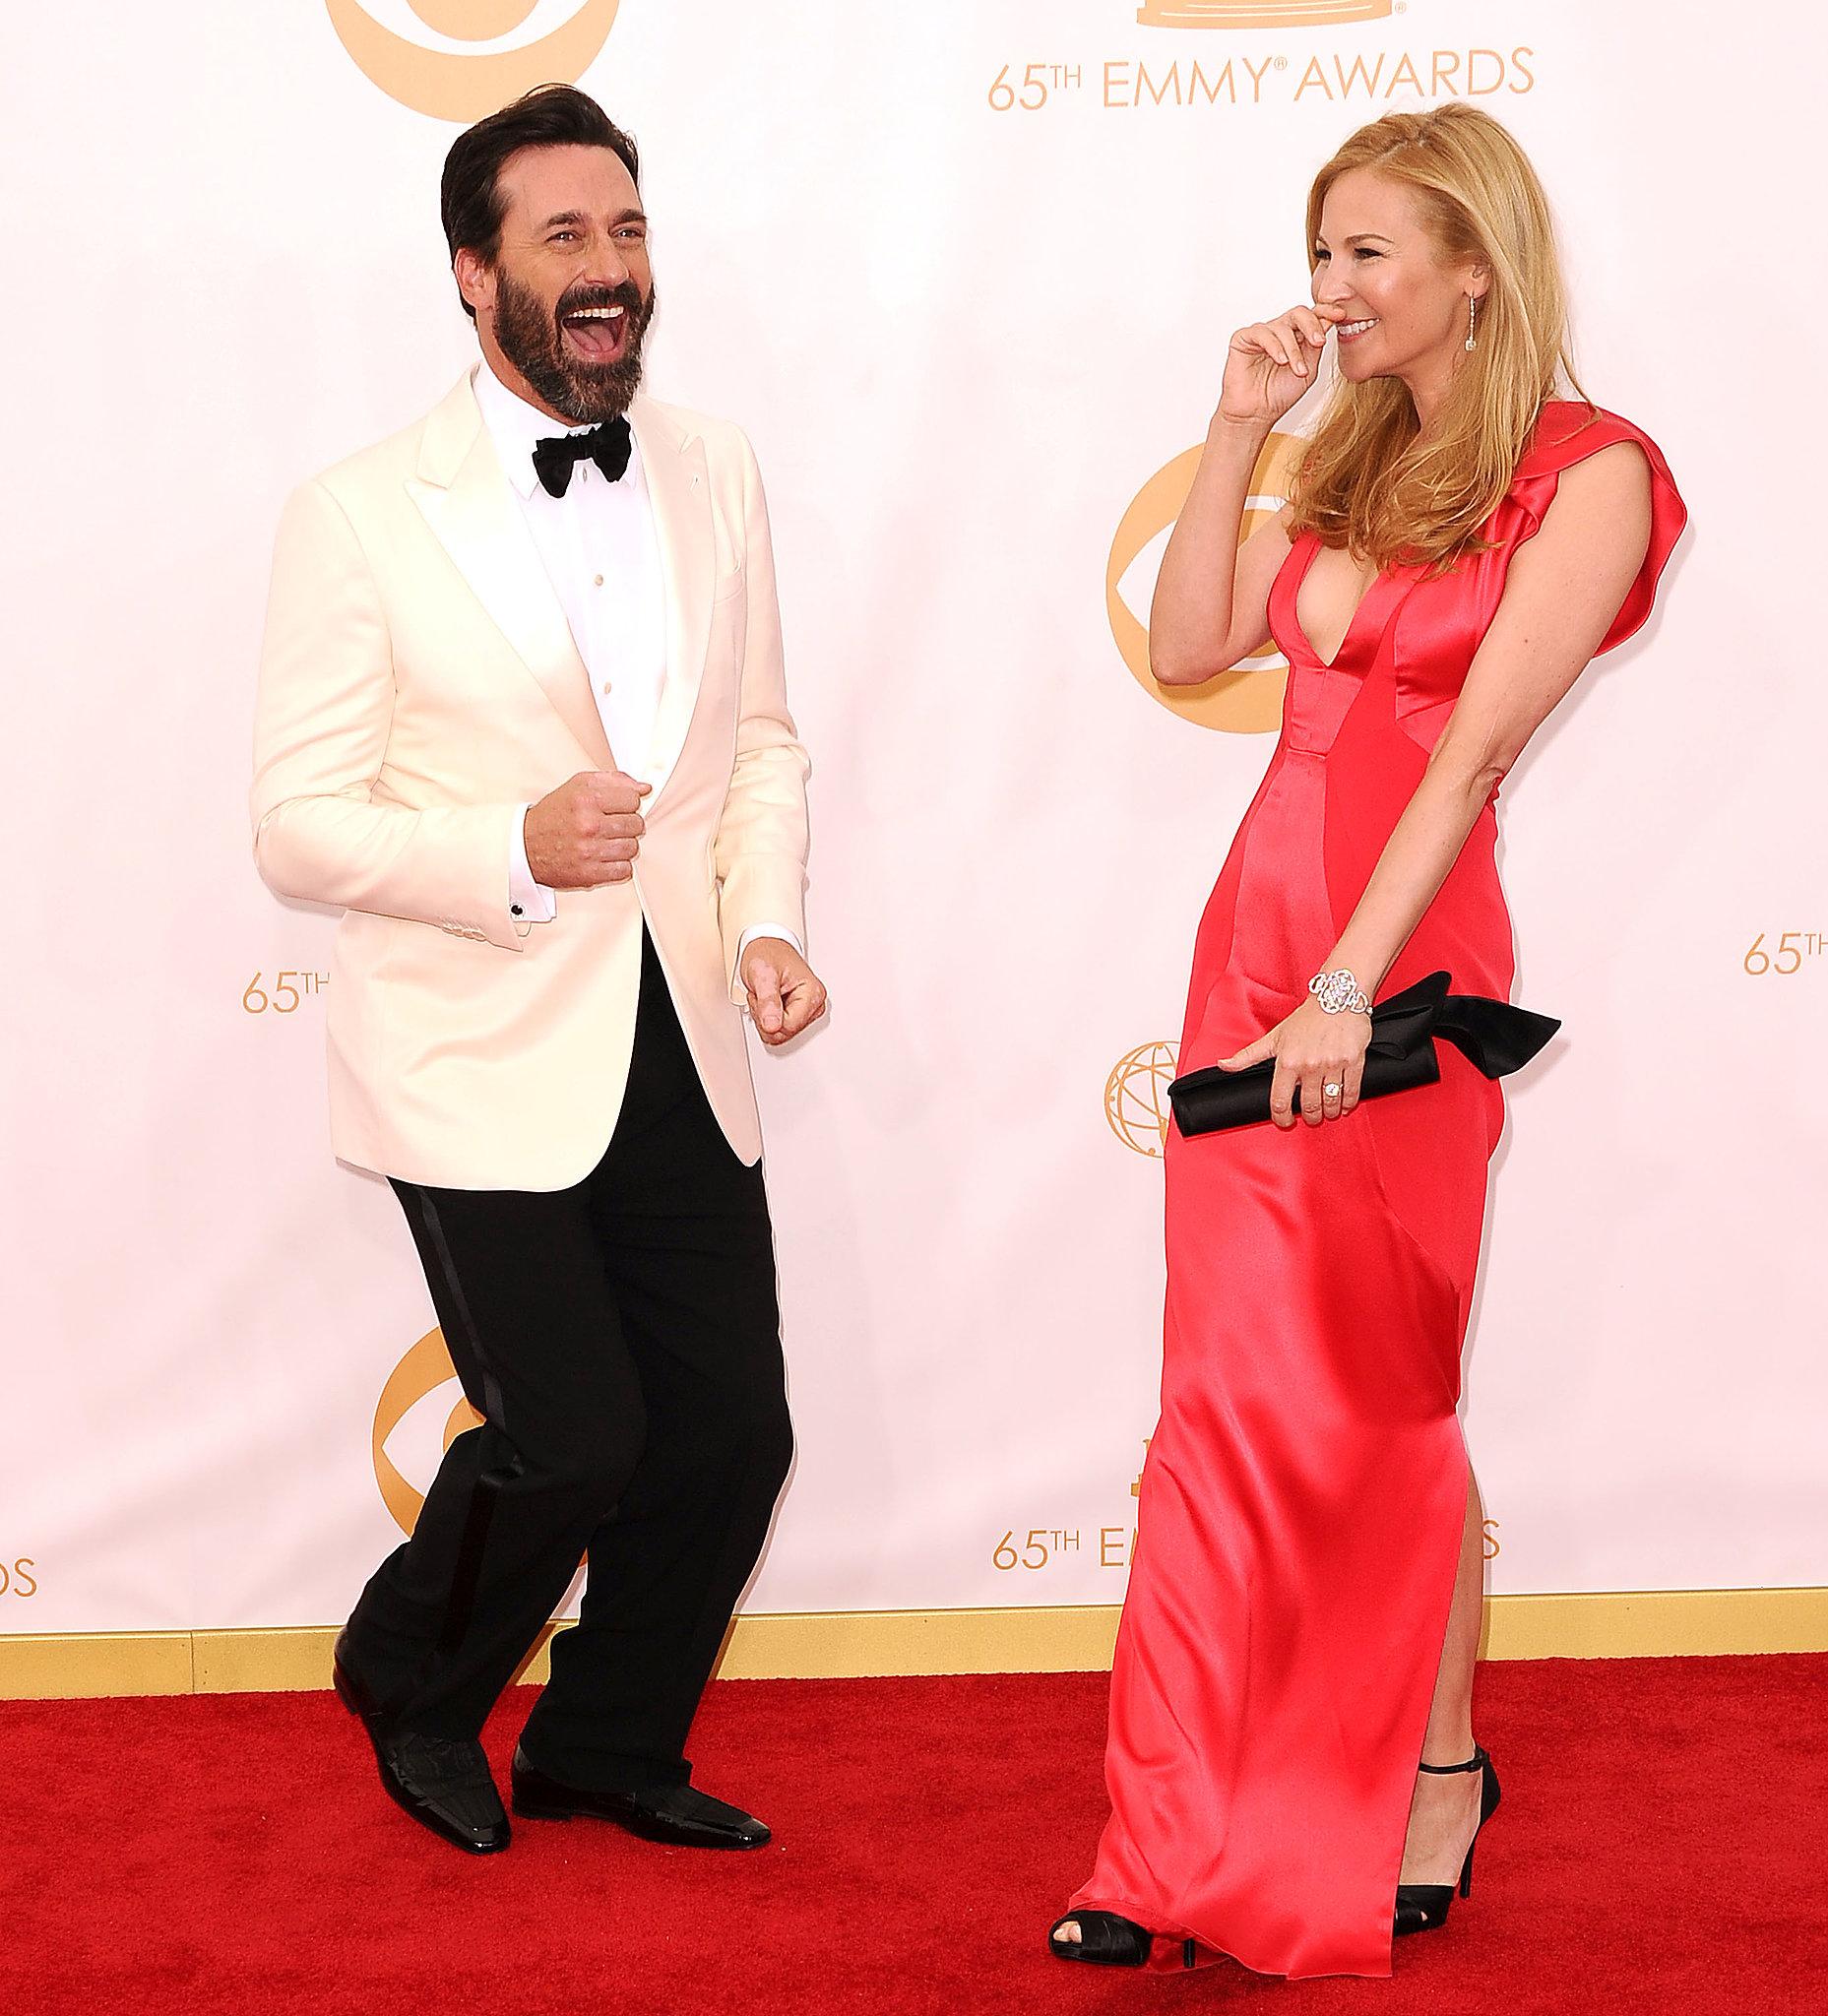 Jon Hamm and Jennifer Westfeldt cracked each other up during the red carpet.